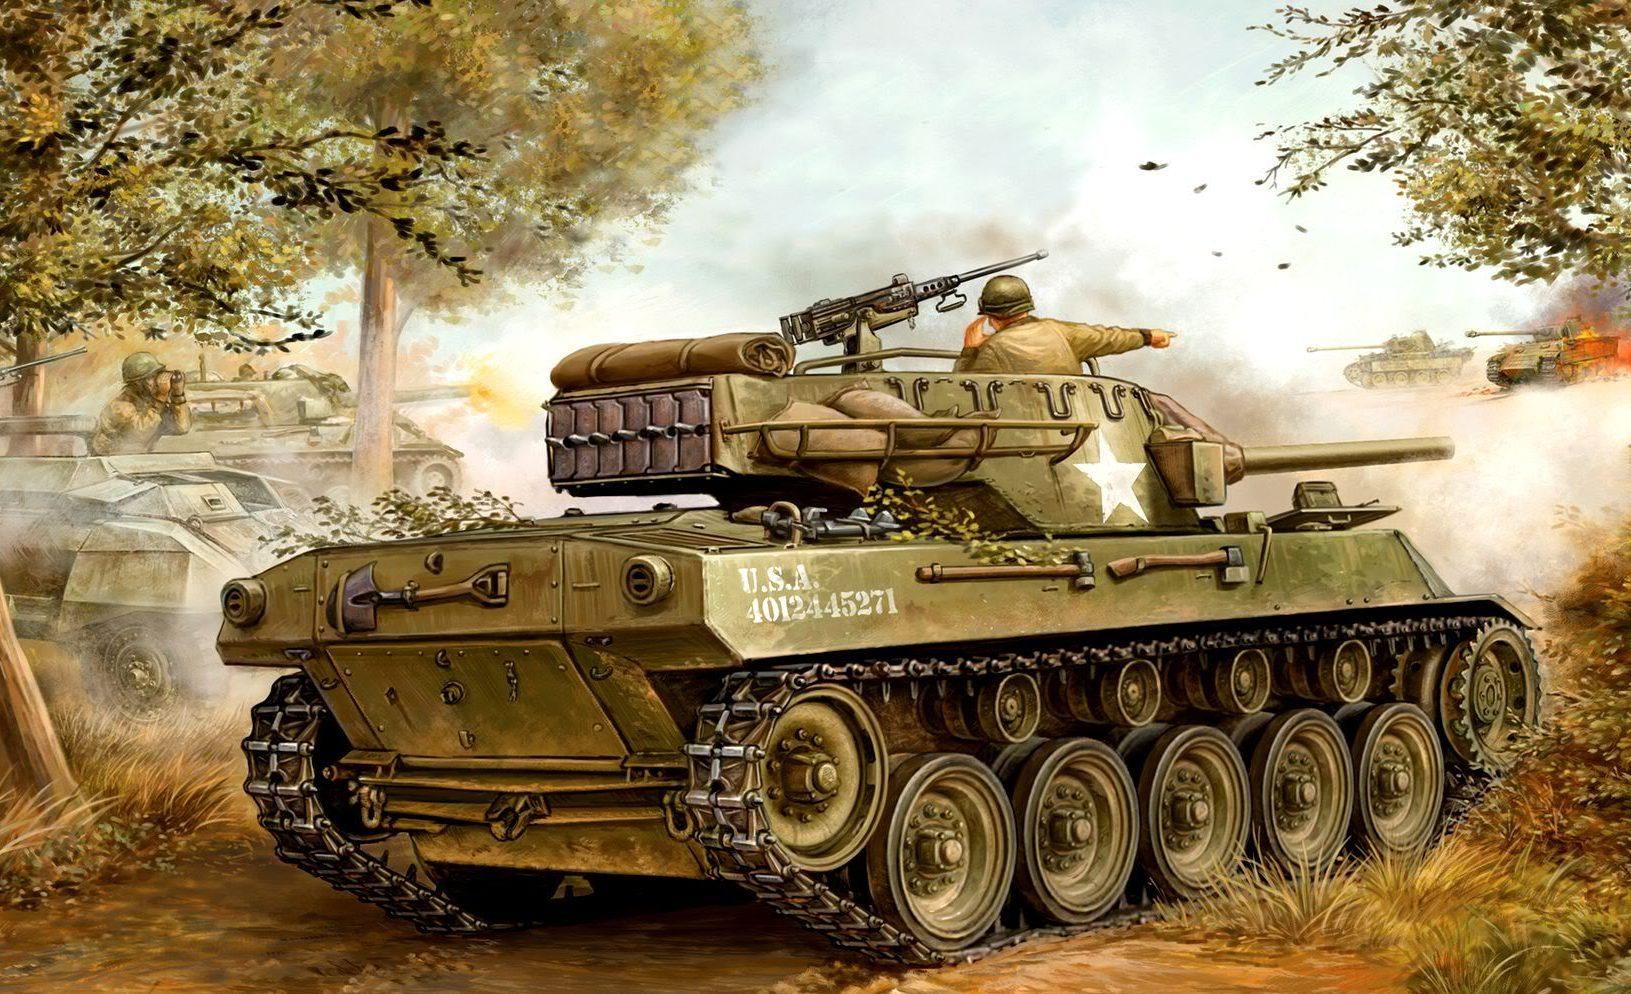 Wai Vincent. САУ М-18 «Hellcat».